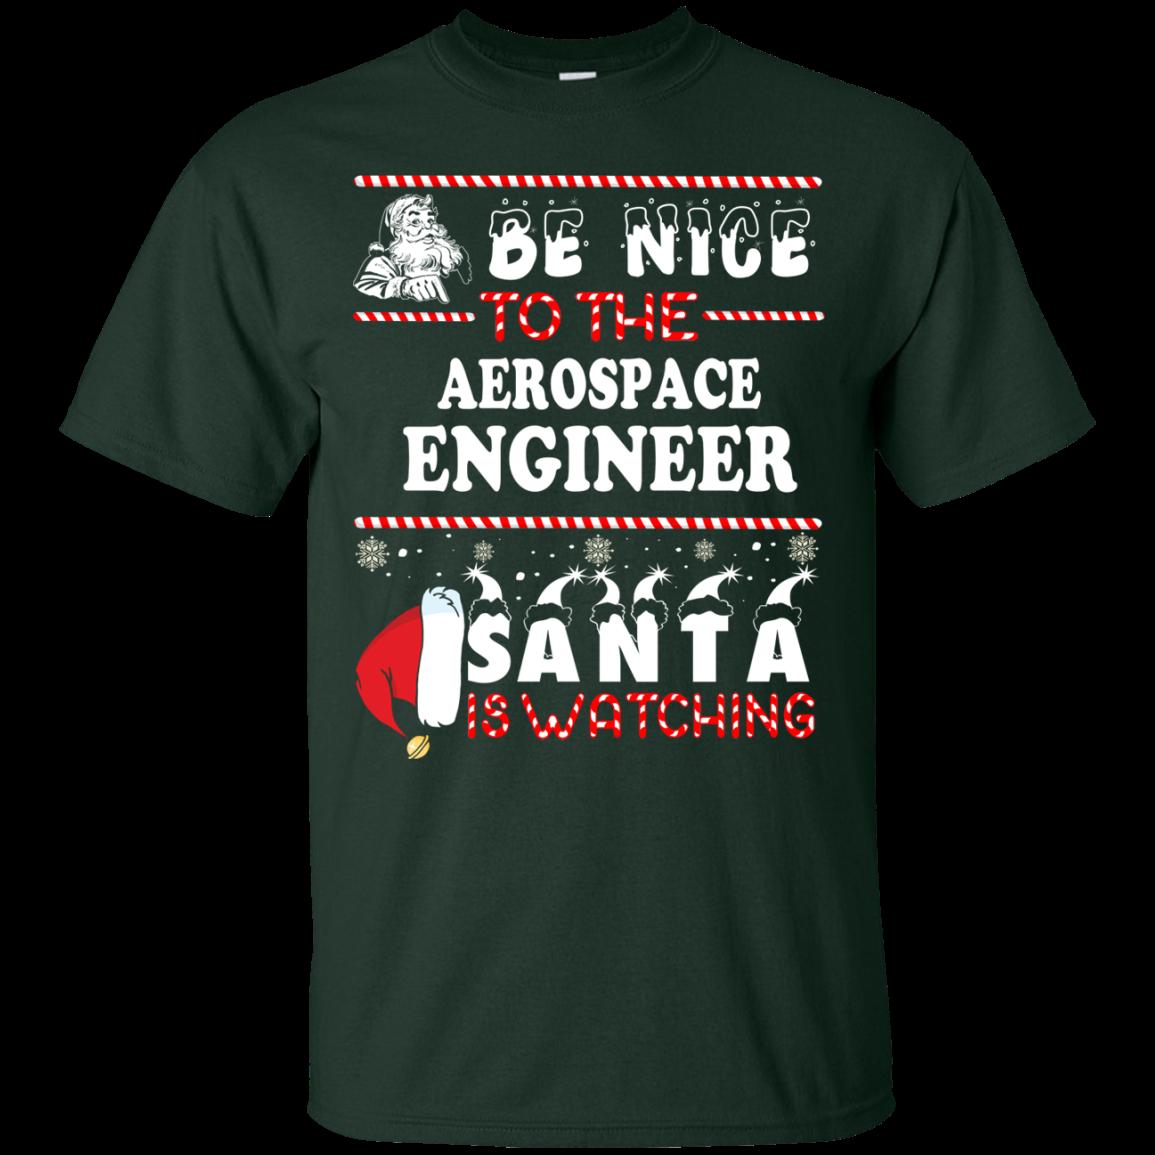 Be Nice To The Aerospace Engineer Santa Is Watching Sweatshirt, T-Shirt